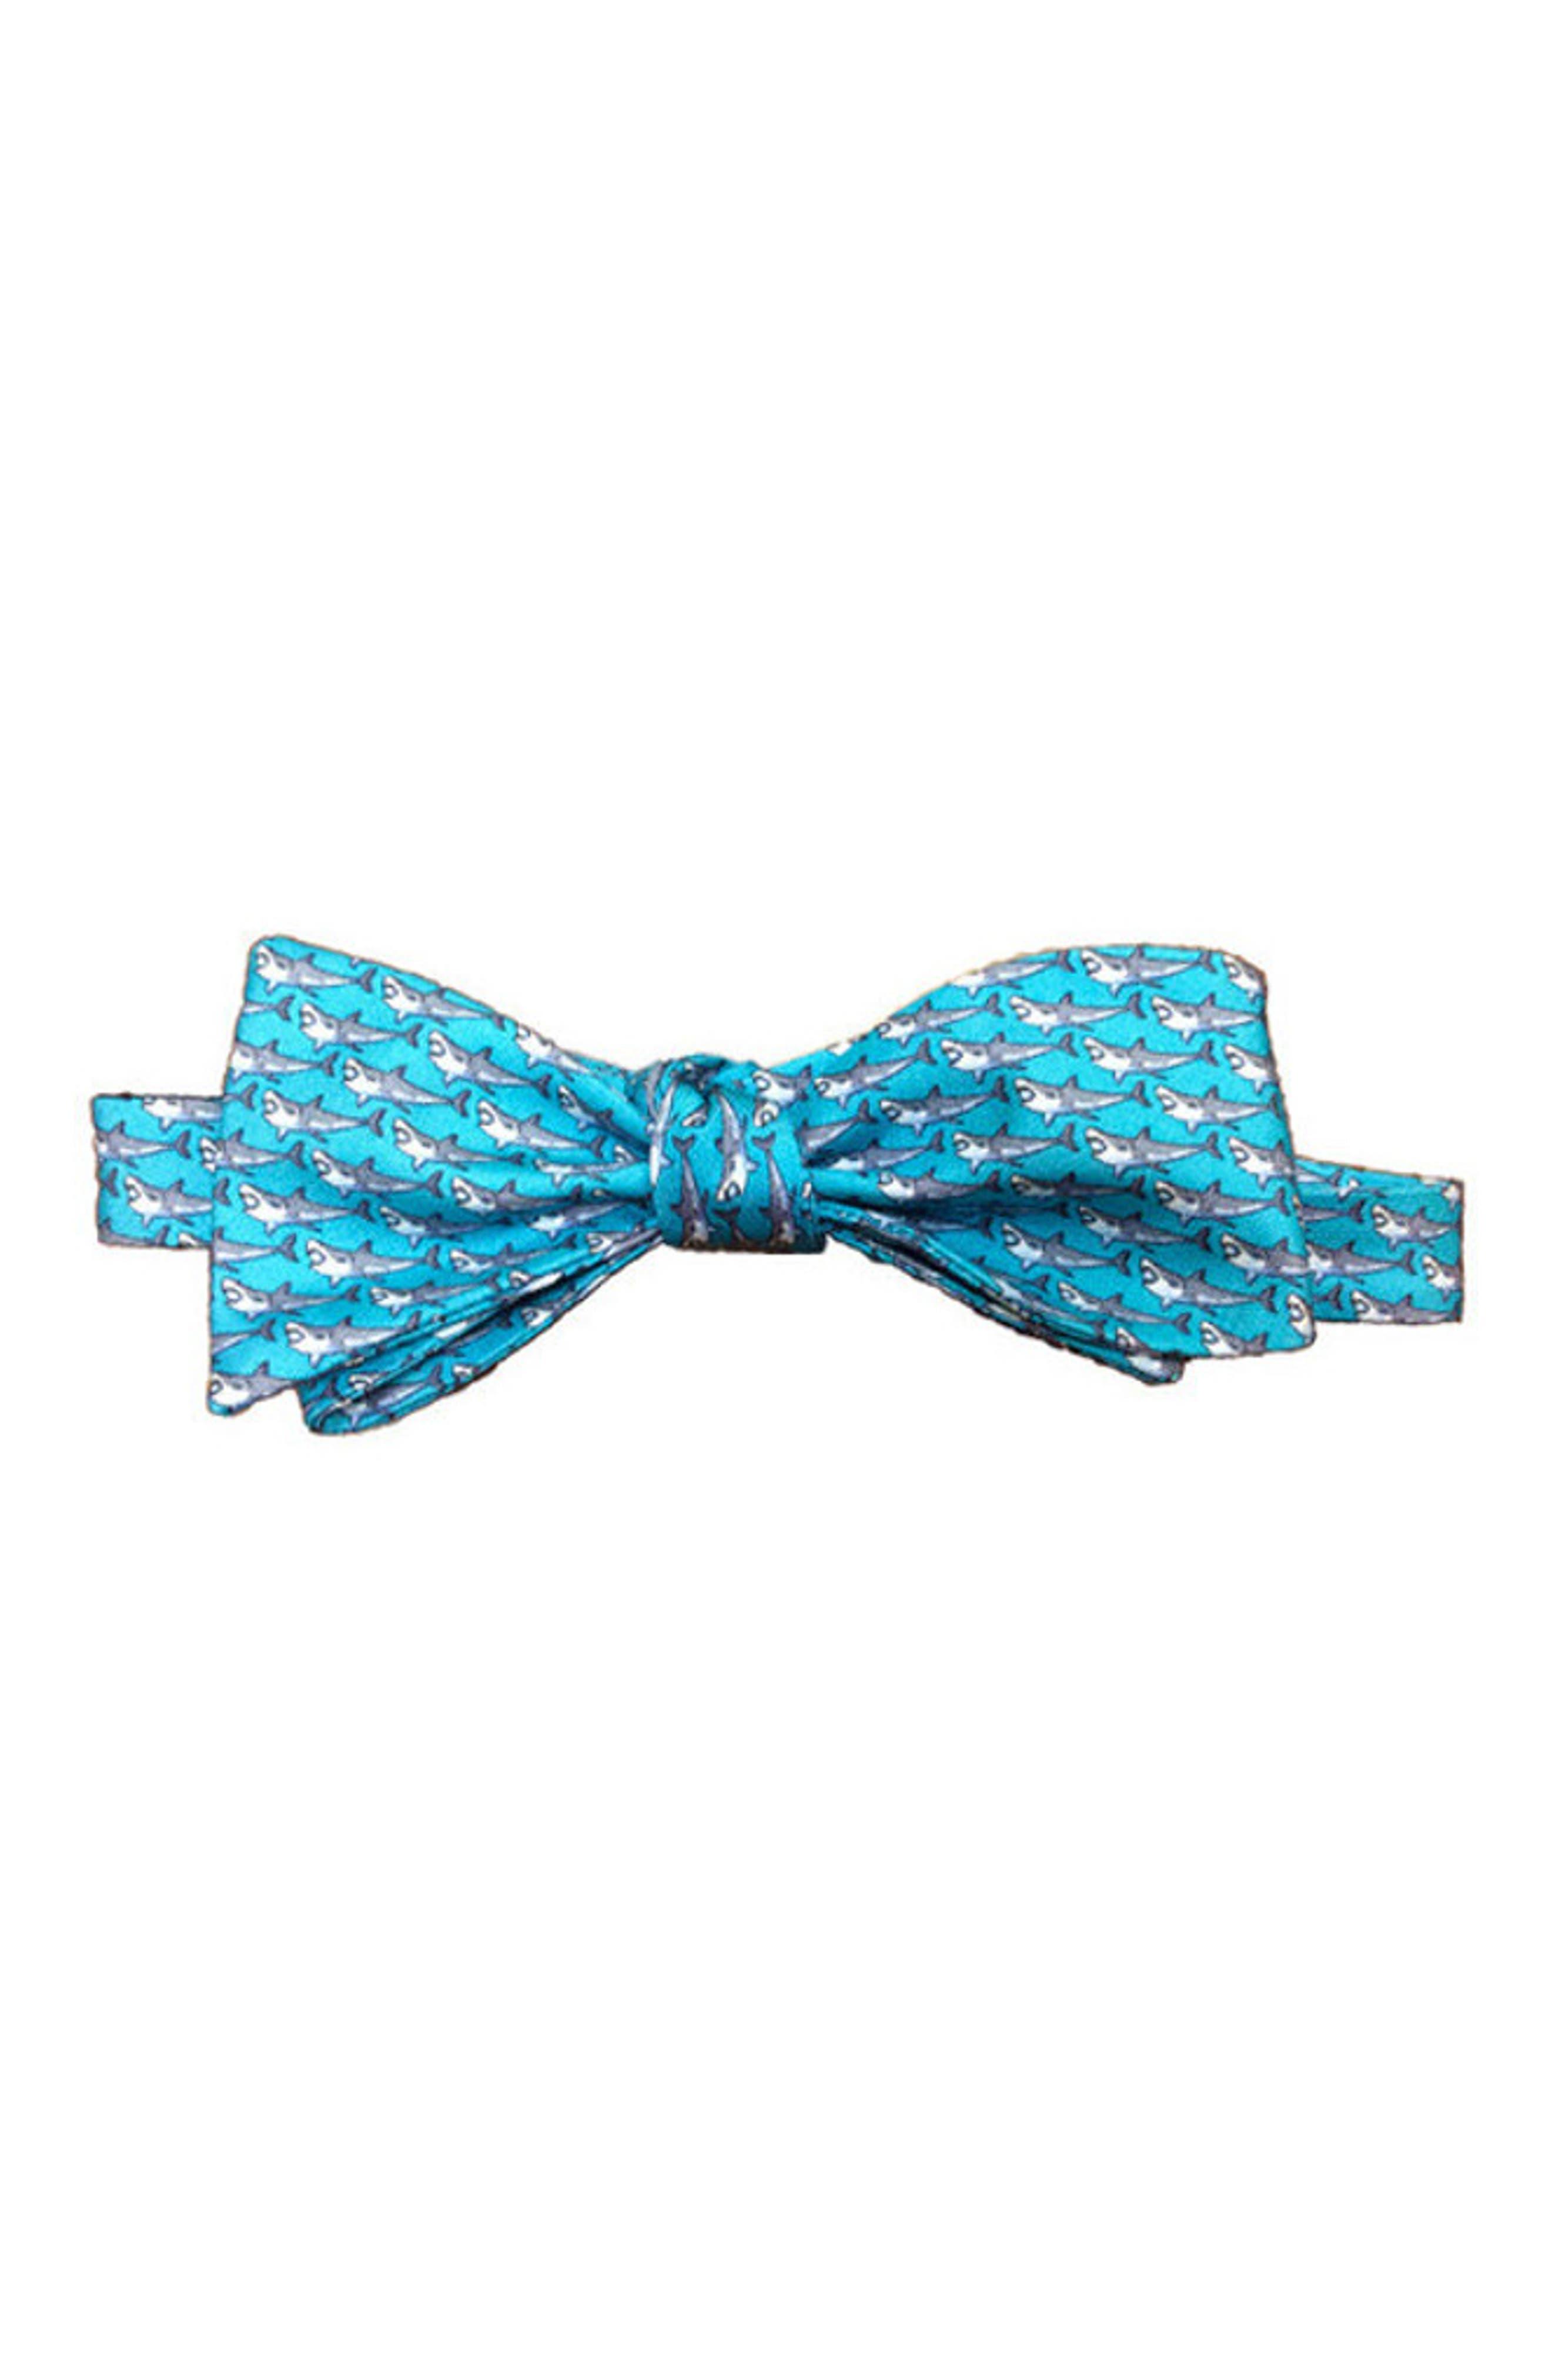 Shark Week Silk Bow Tie,                             Main thumbnail 1, color,                             Turquoise